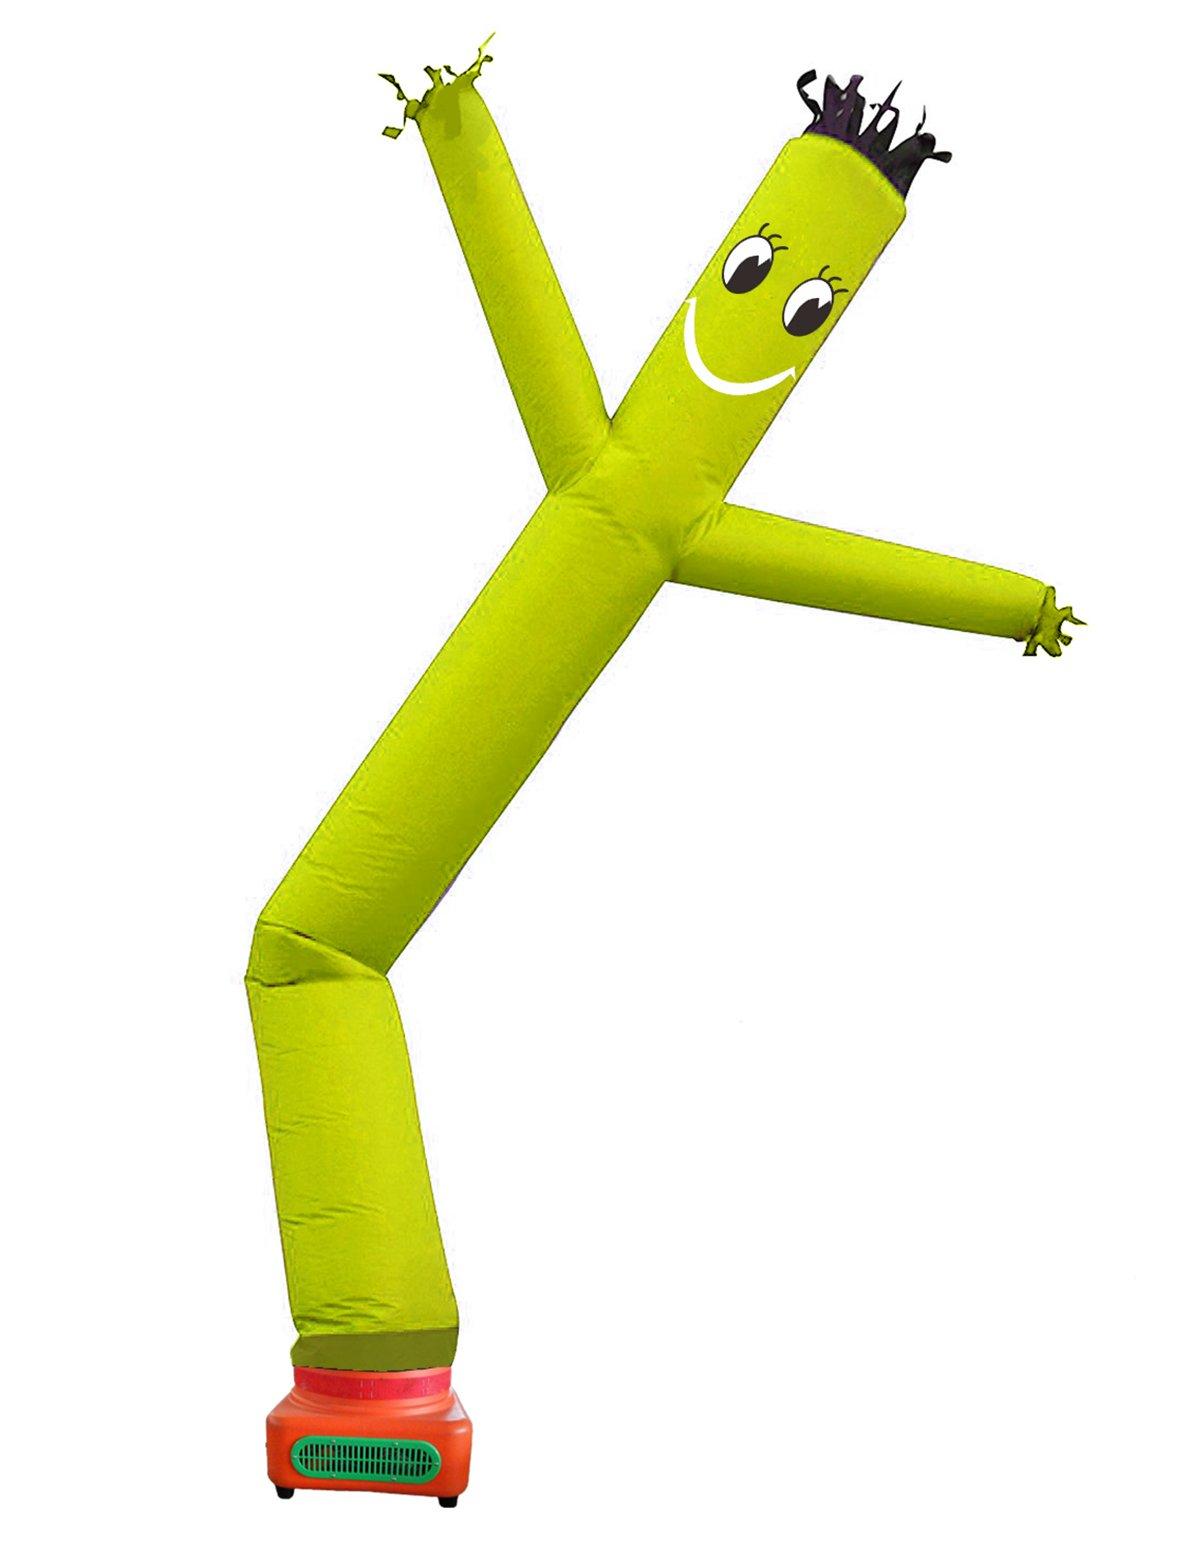 10 Feet Promtion single leg Tube Cartoon,Sky Puppet tube man Dancer, Advertising Windy Moving Dancer Man,inflatable wave man (yellow)